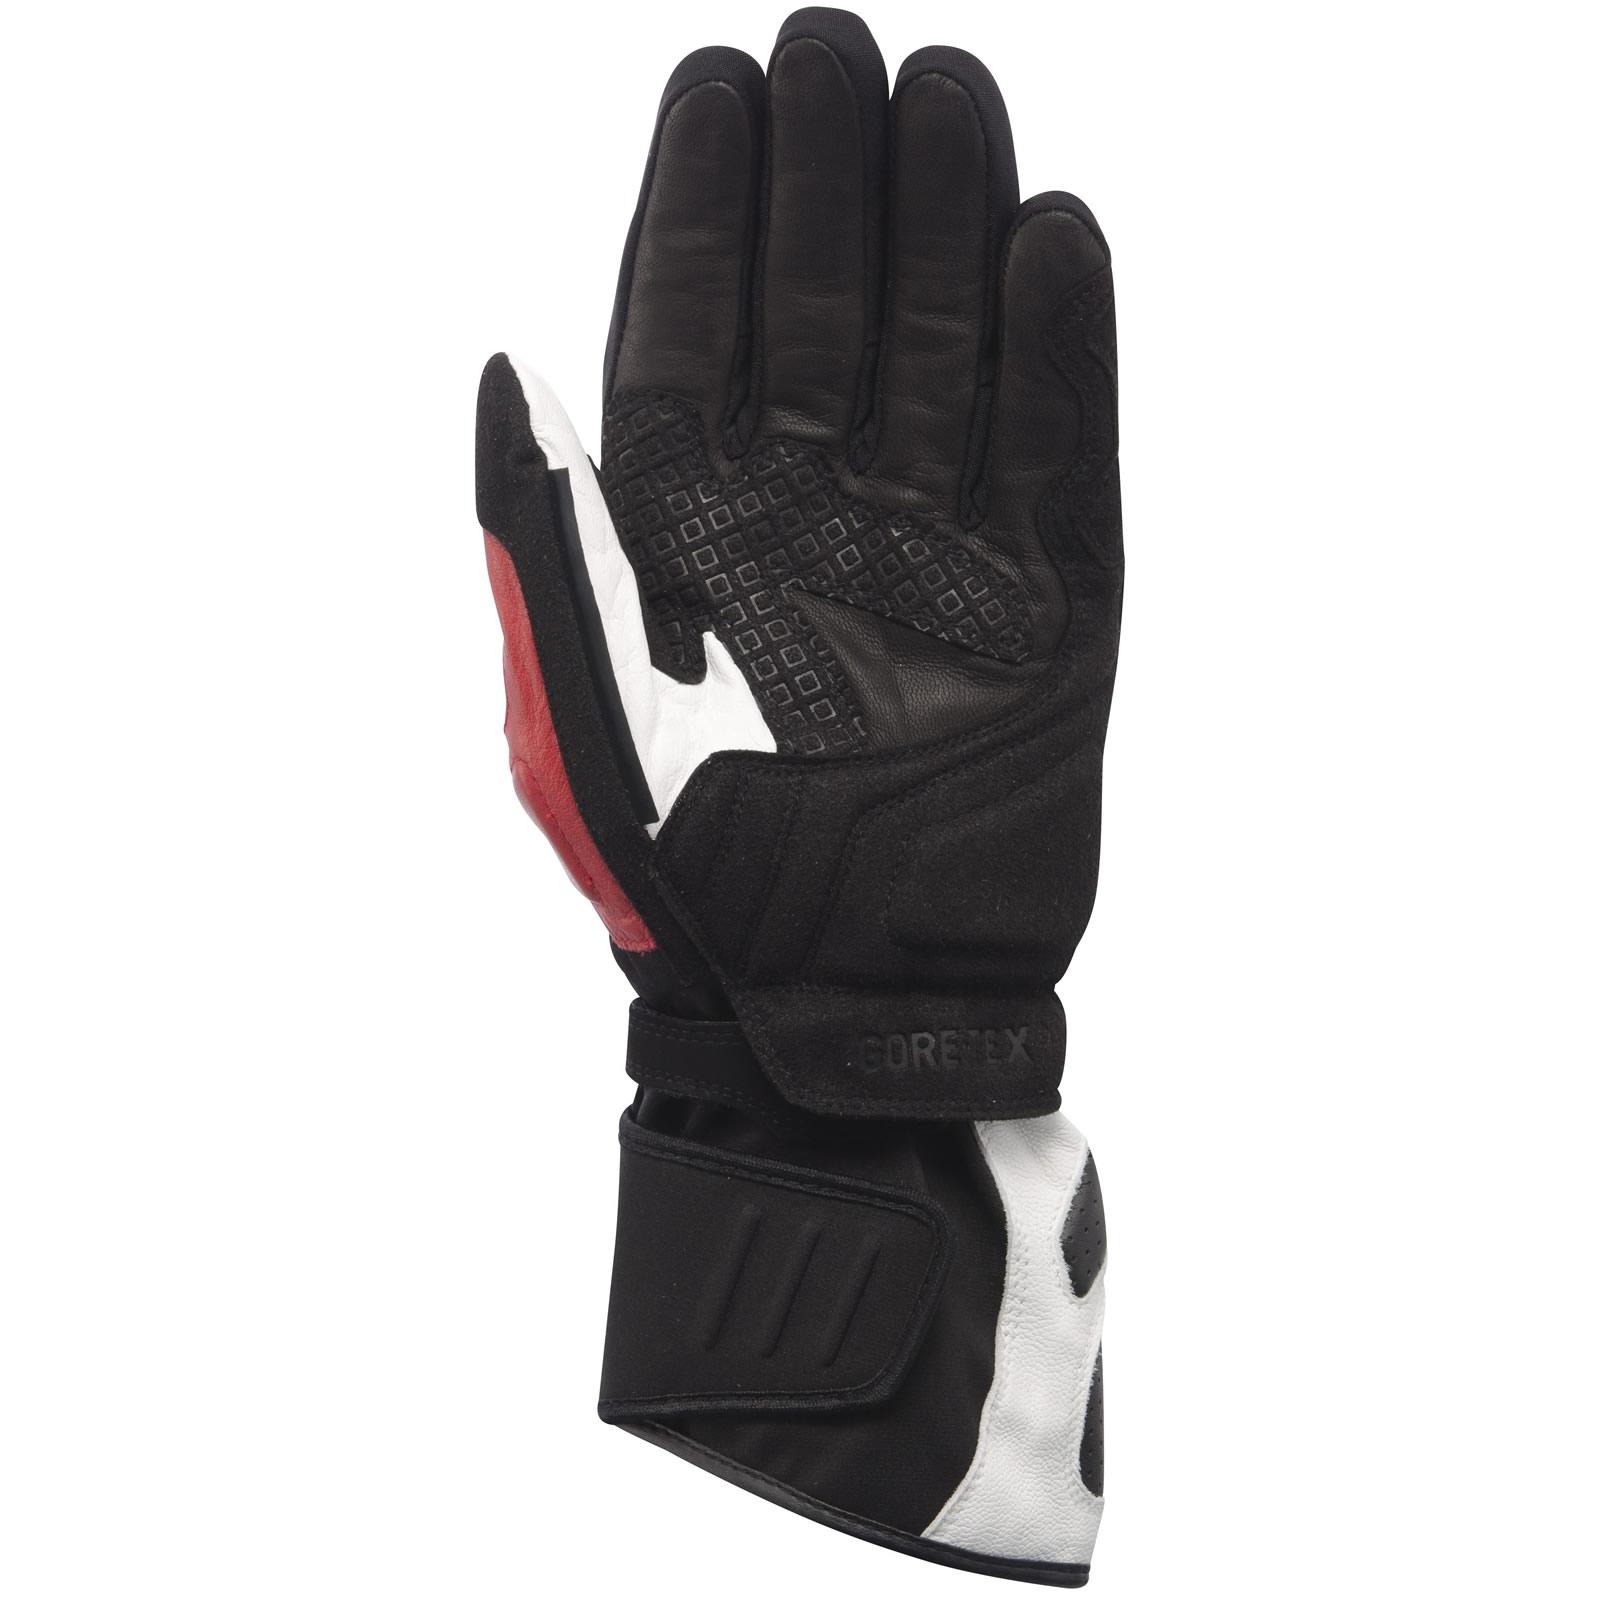 Xtrafit motorcycle gloves - Thumbnail 5